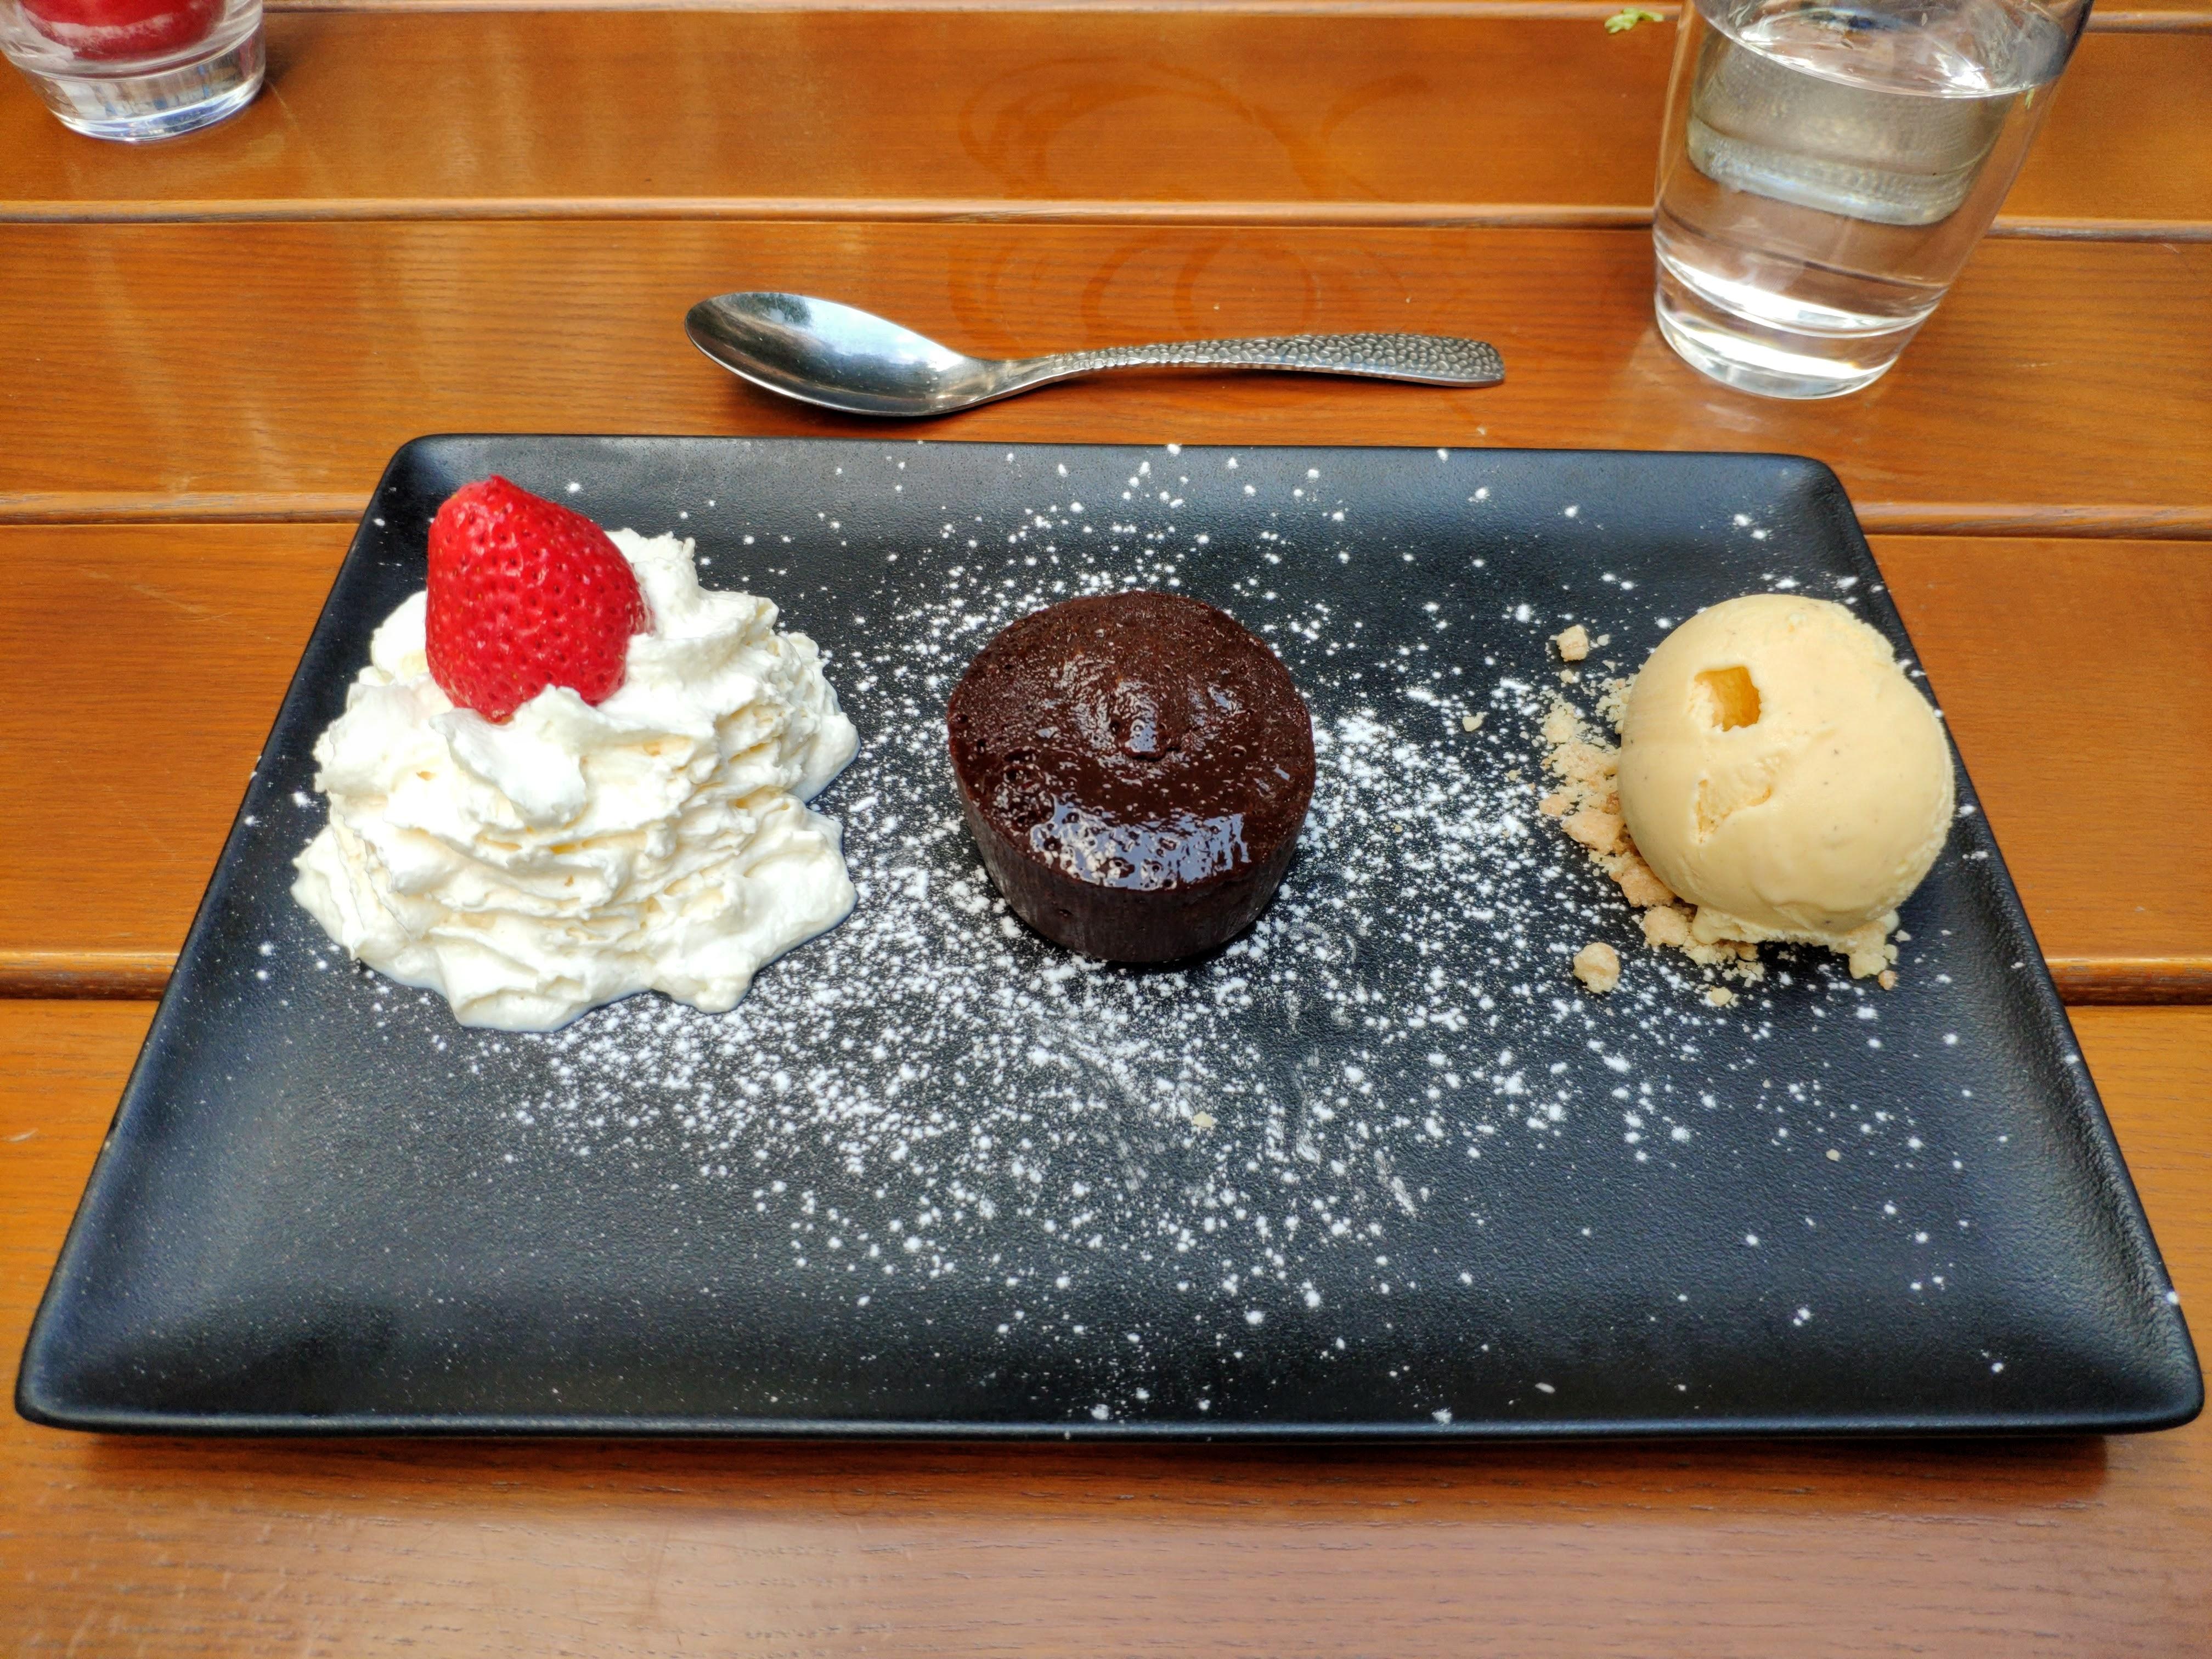 https://foodloader.net/nico_2020-07-20_mi-cuit-chocolat-et-glace-vanille.jpg